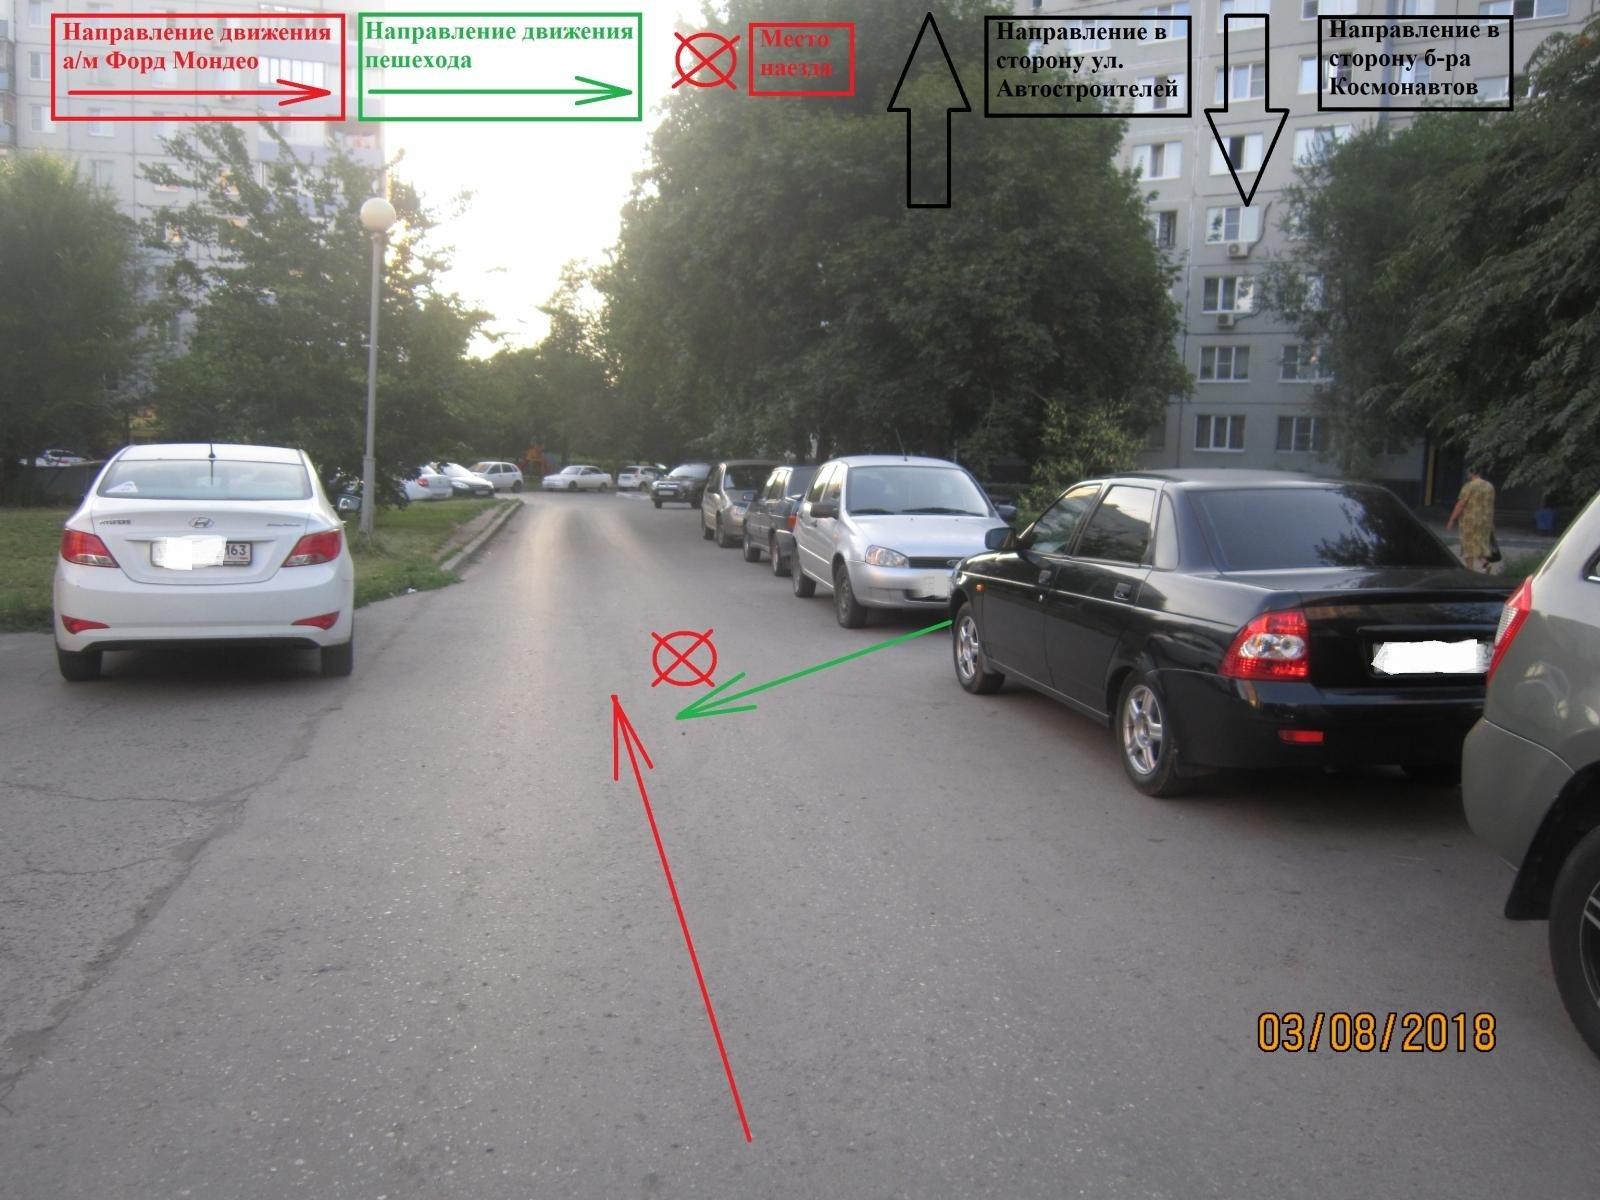 12-летнюю девочку сбила машина во дворе дома на Автостроителей